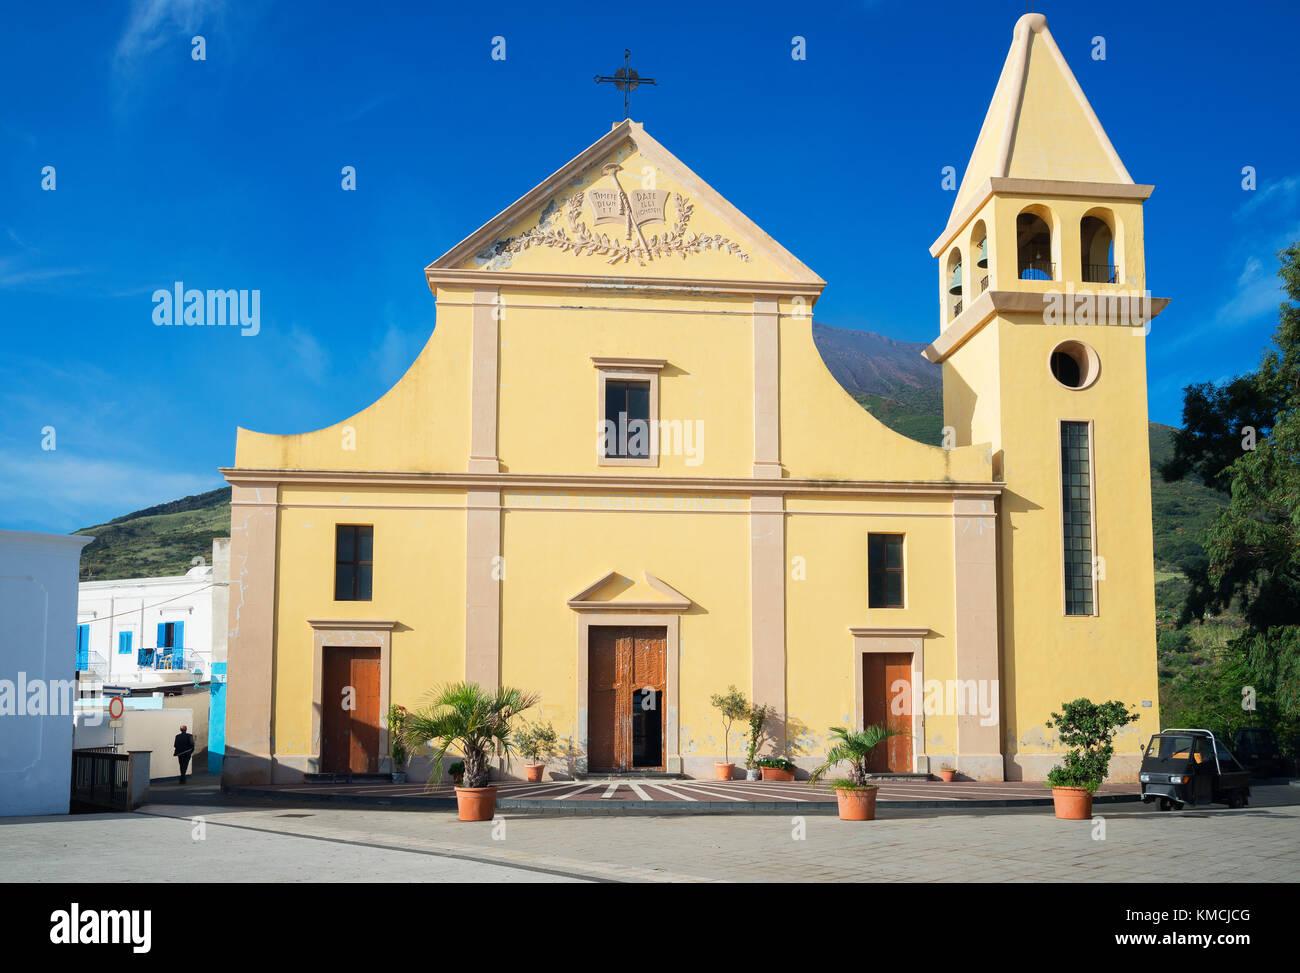 San Vincenzo Ferreri Kirche, Stromboli, Äolische Inseln, Weltkulturerbe der UNESCO, Sizilien, Italien, Mittelmeer, Stockbild